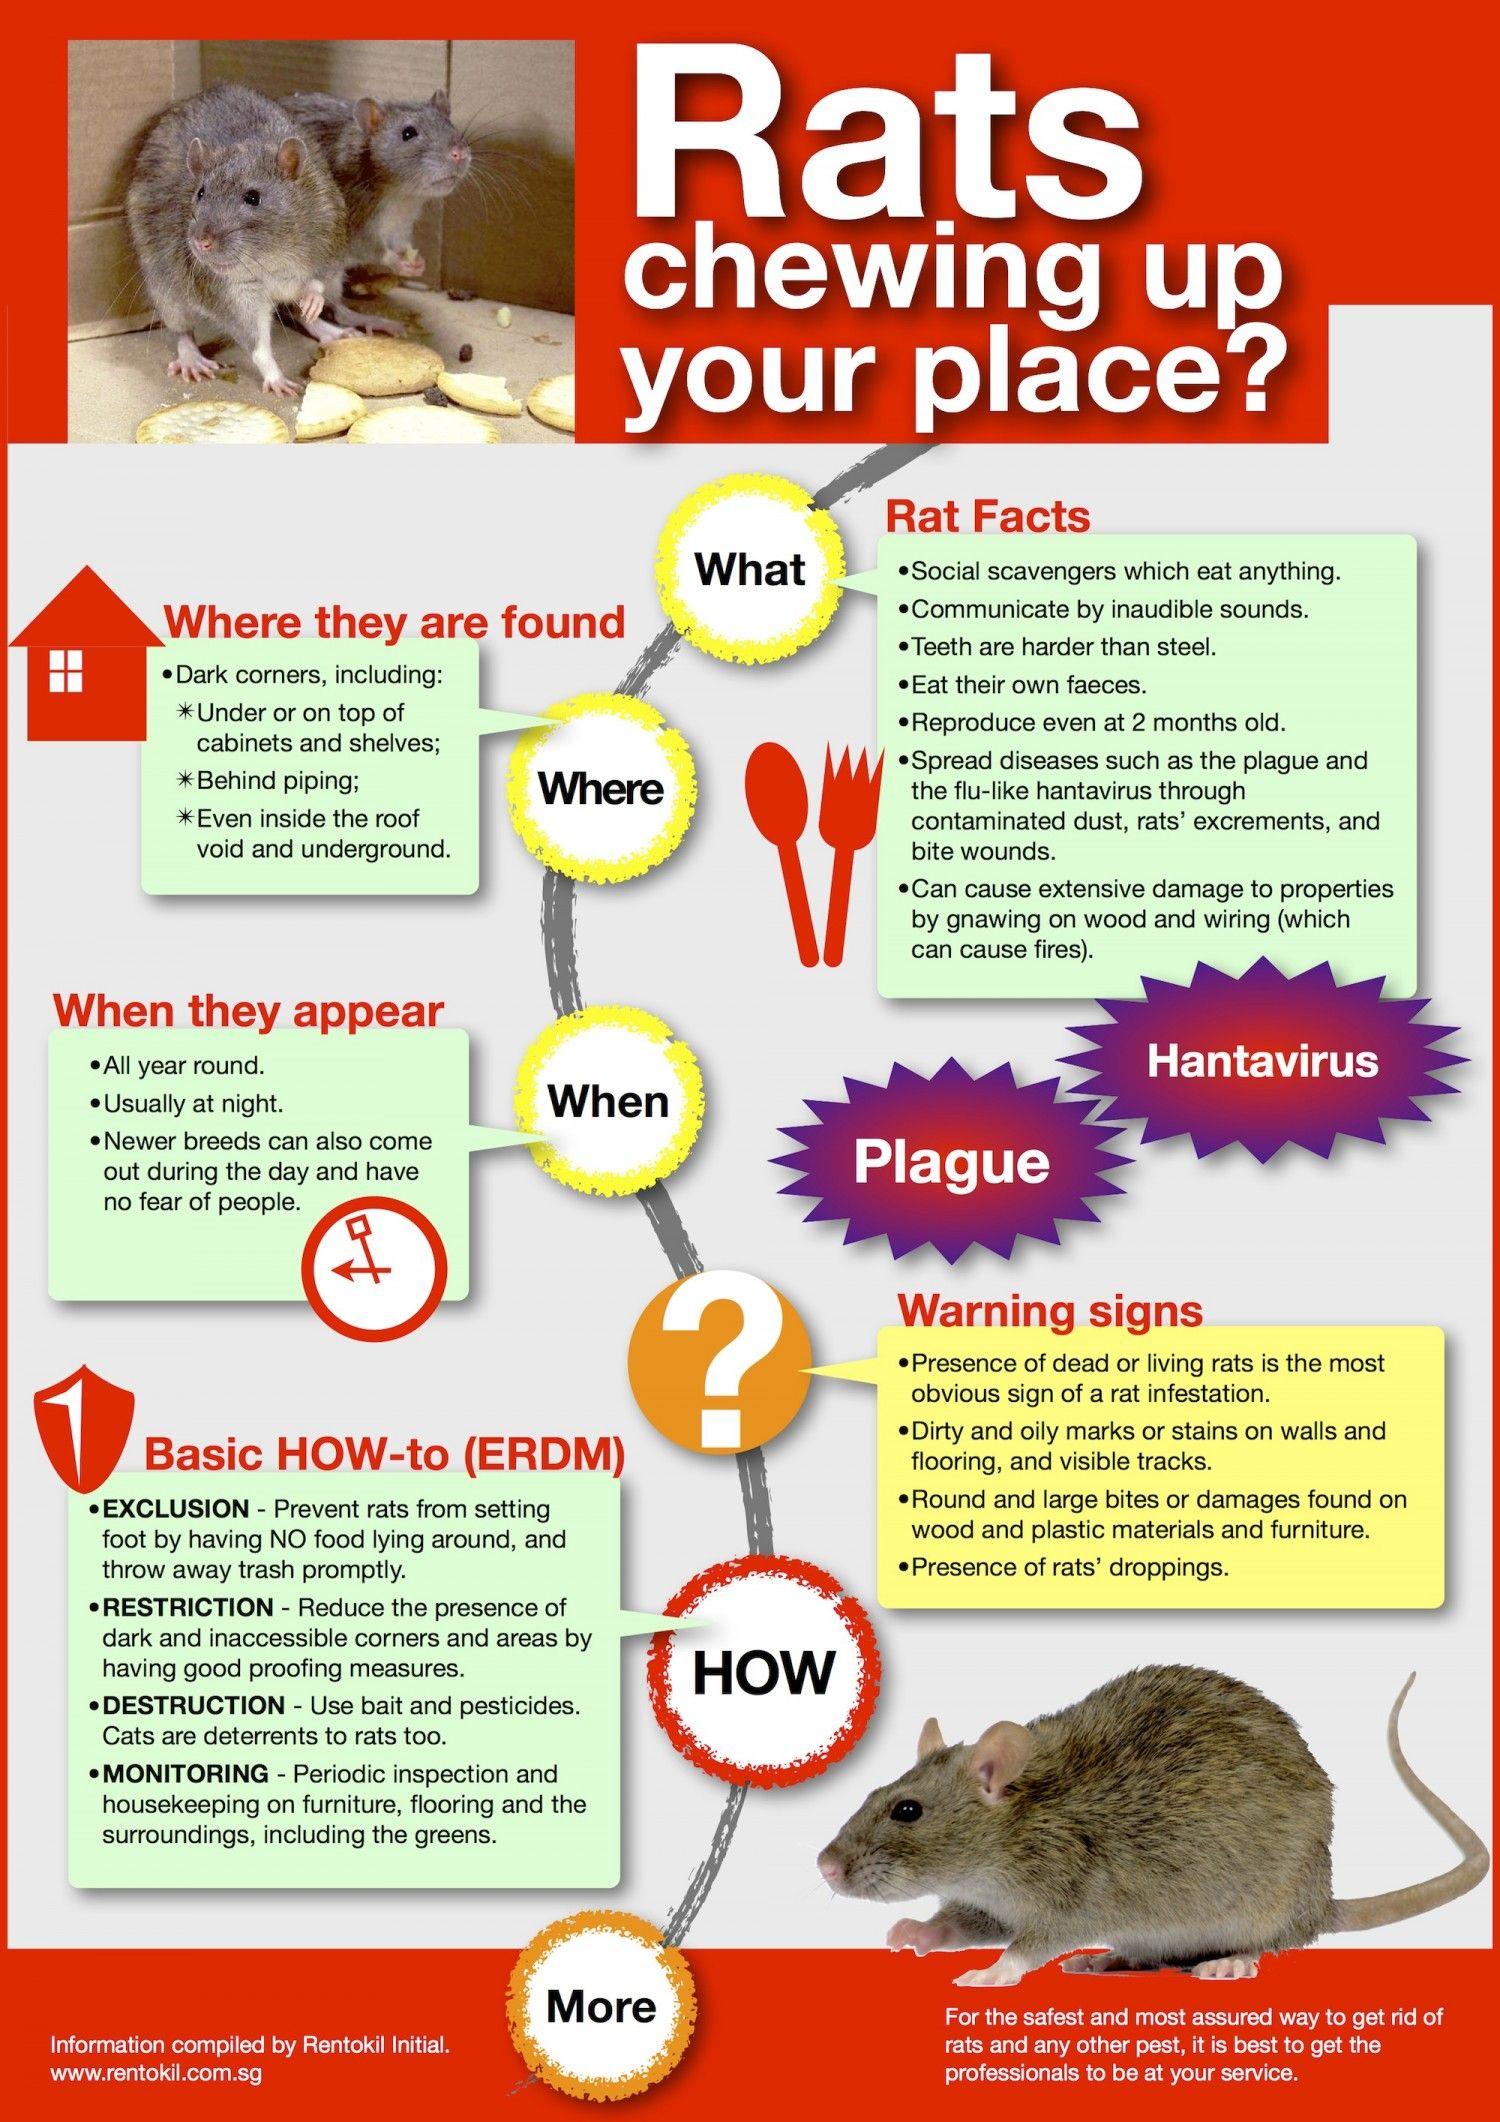 Rats Teeth Are Stronger Than Steel Dealing With Rodents Pests Circuits Online Artikelen Visual Basic En De Printerpoort